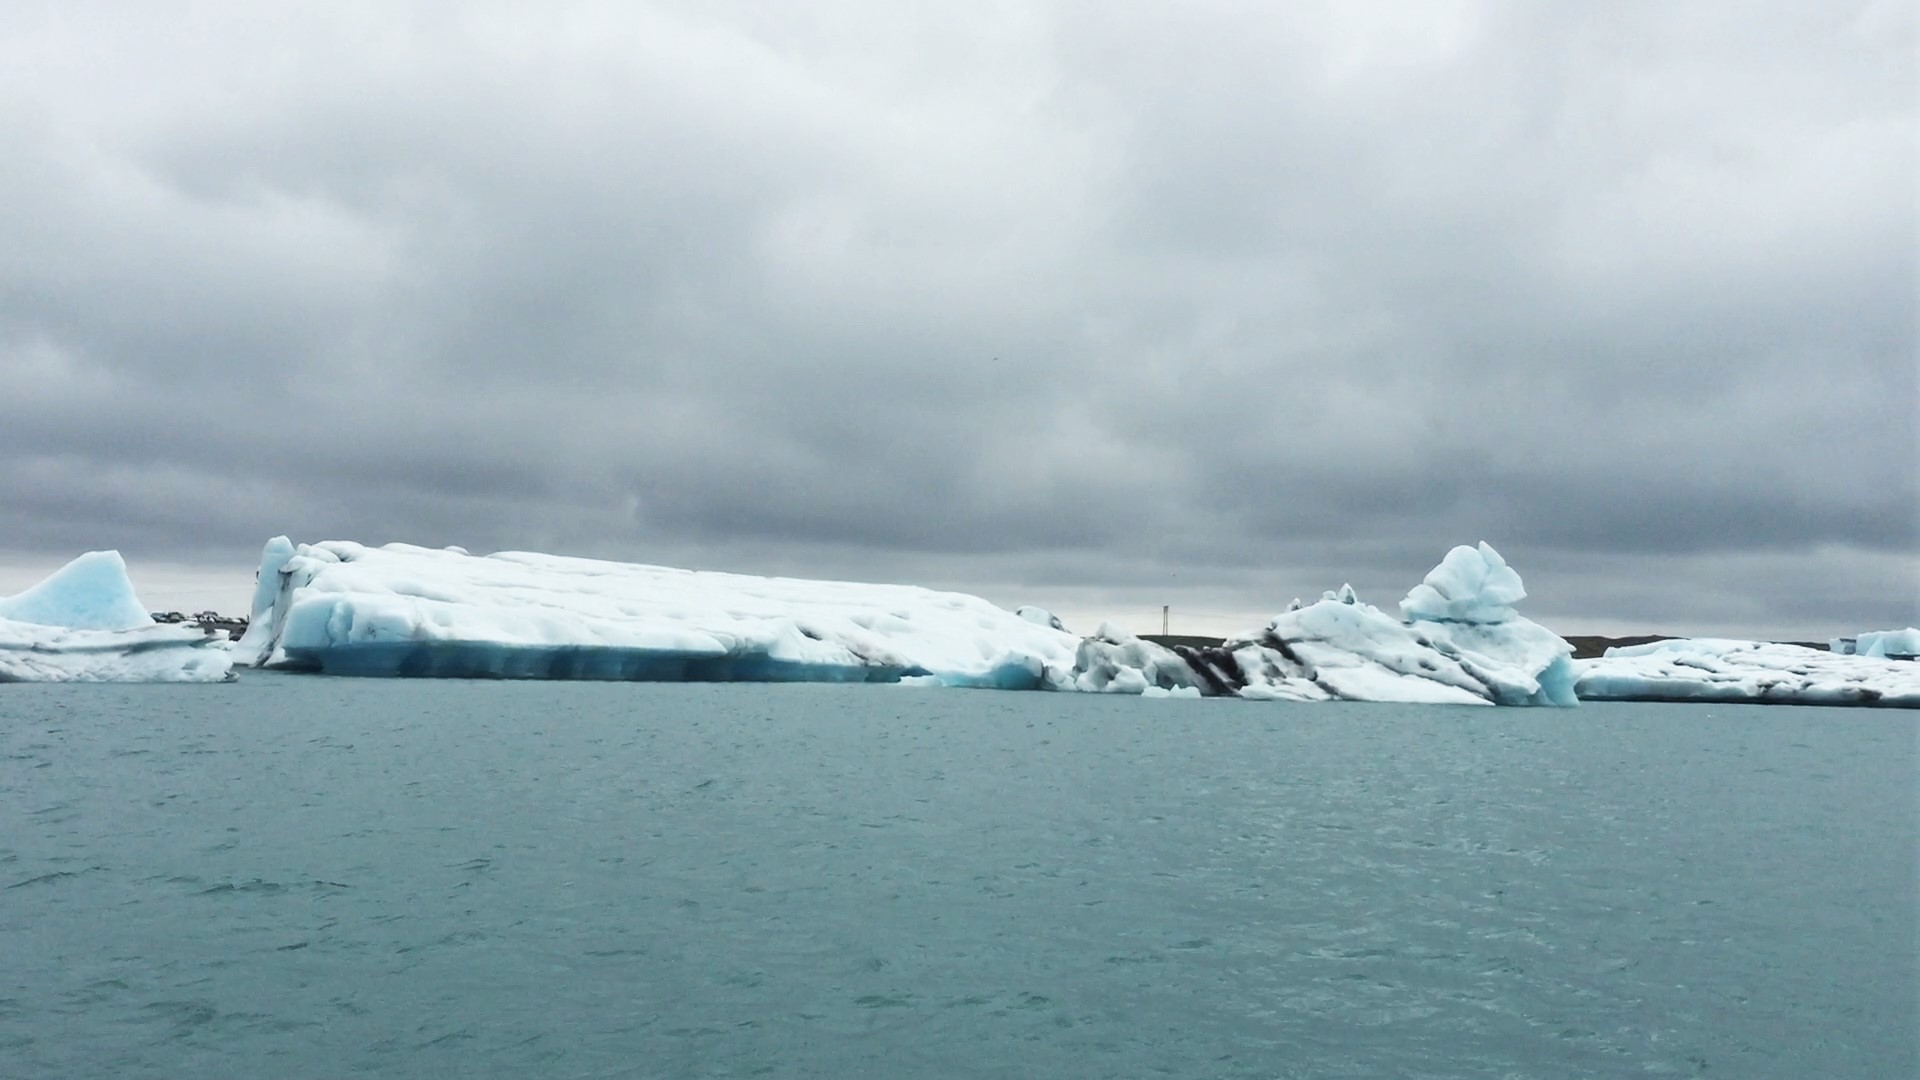 Jakulsarlon Glacier Lagoon